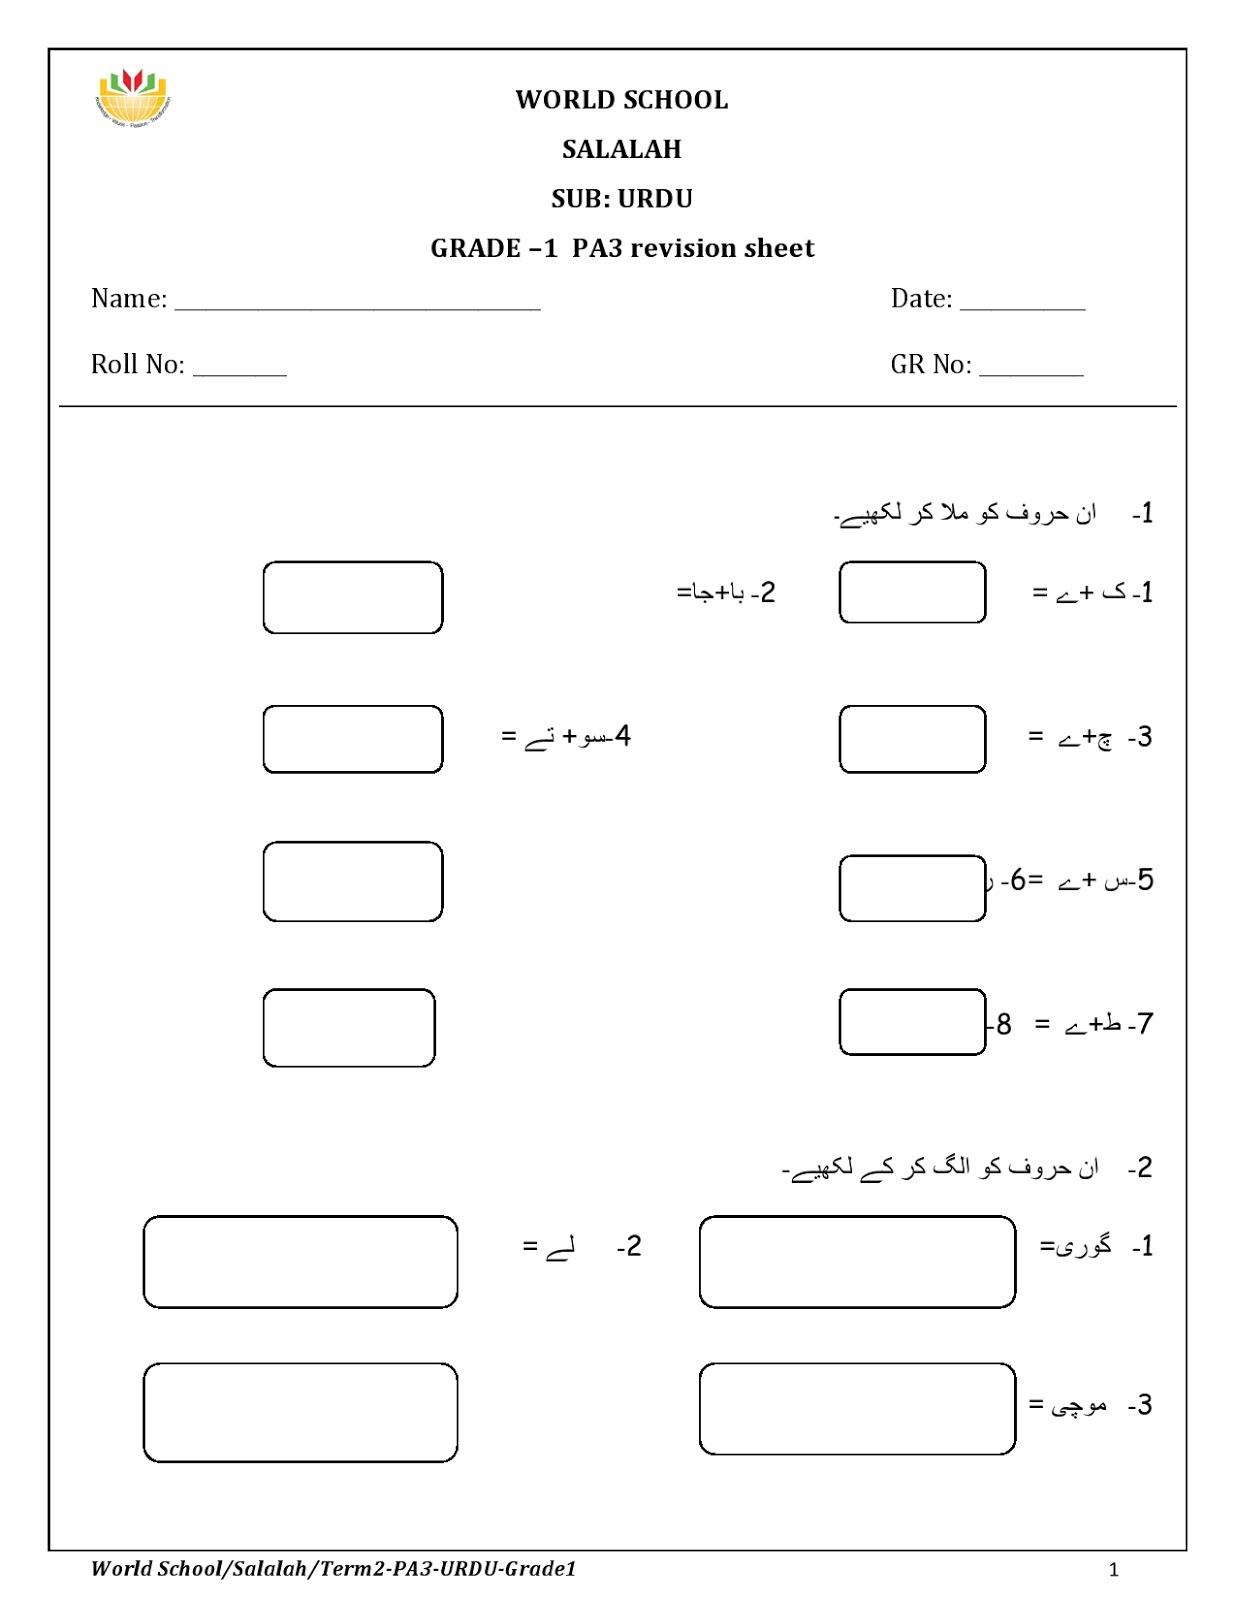 Birla World School Oman Homework For Grade 1 As On 13 03